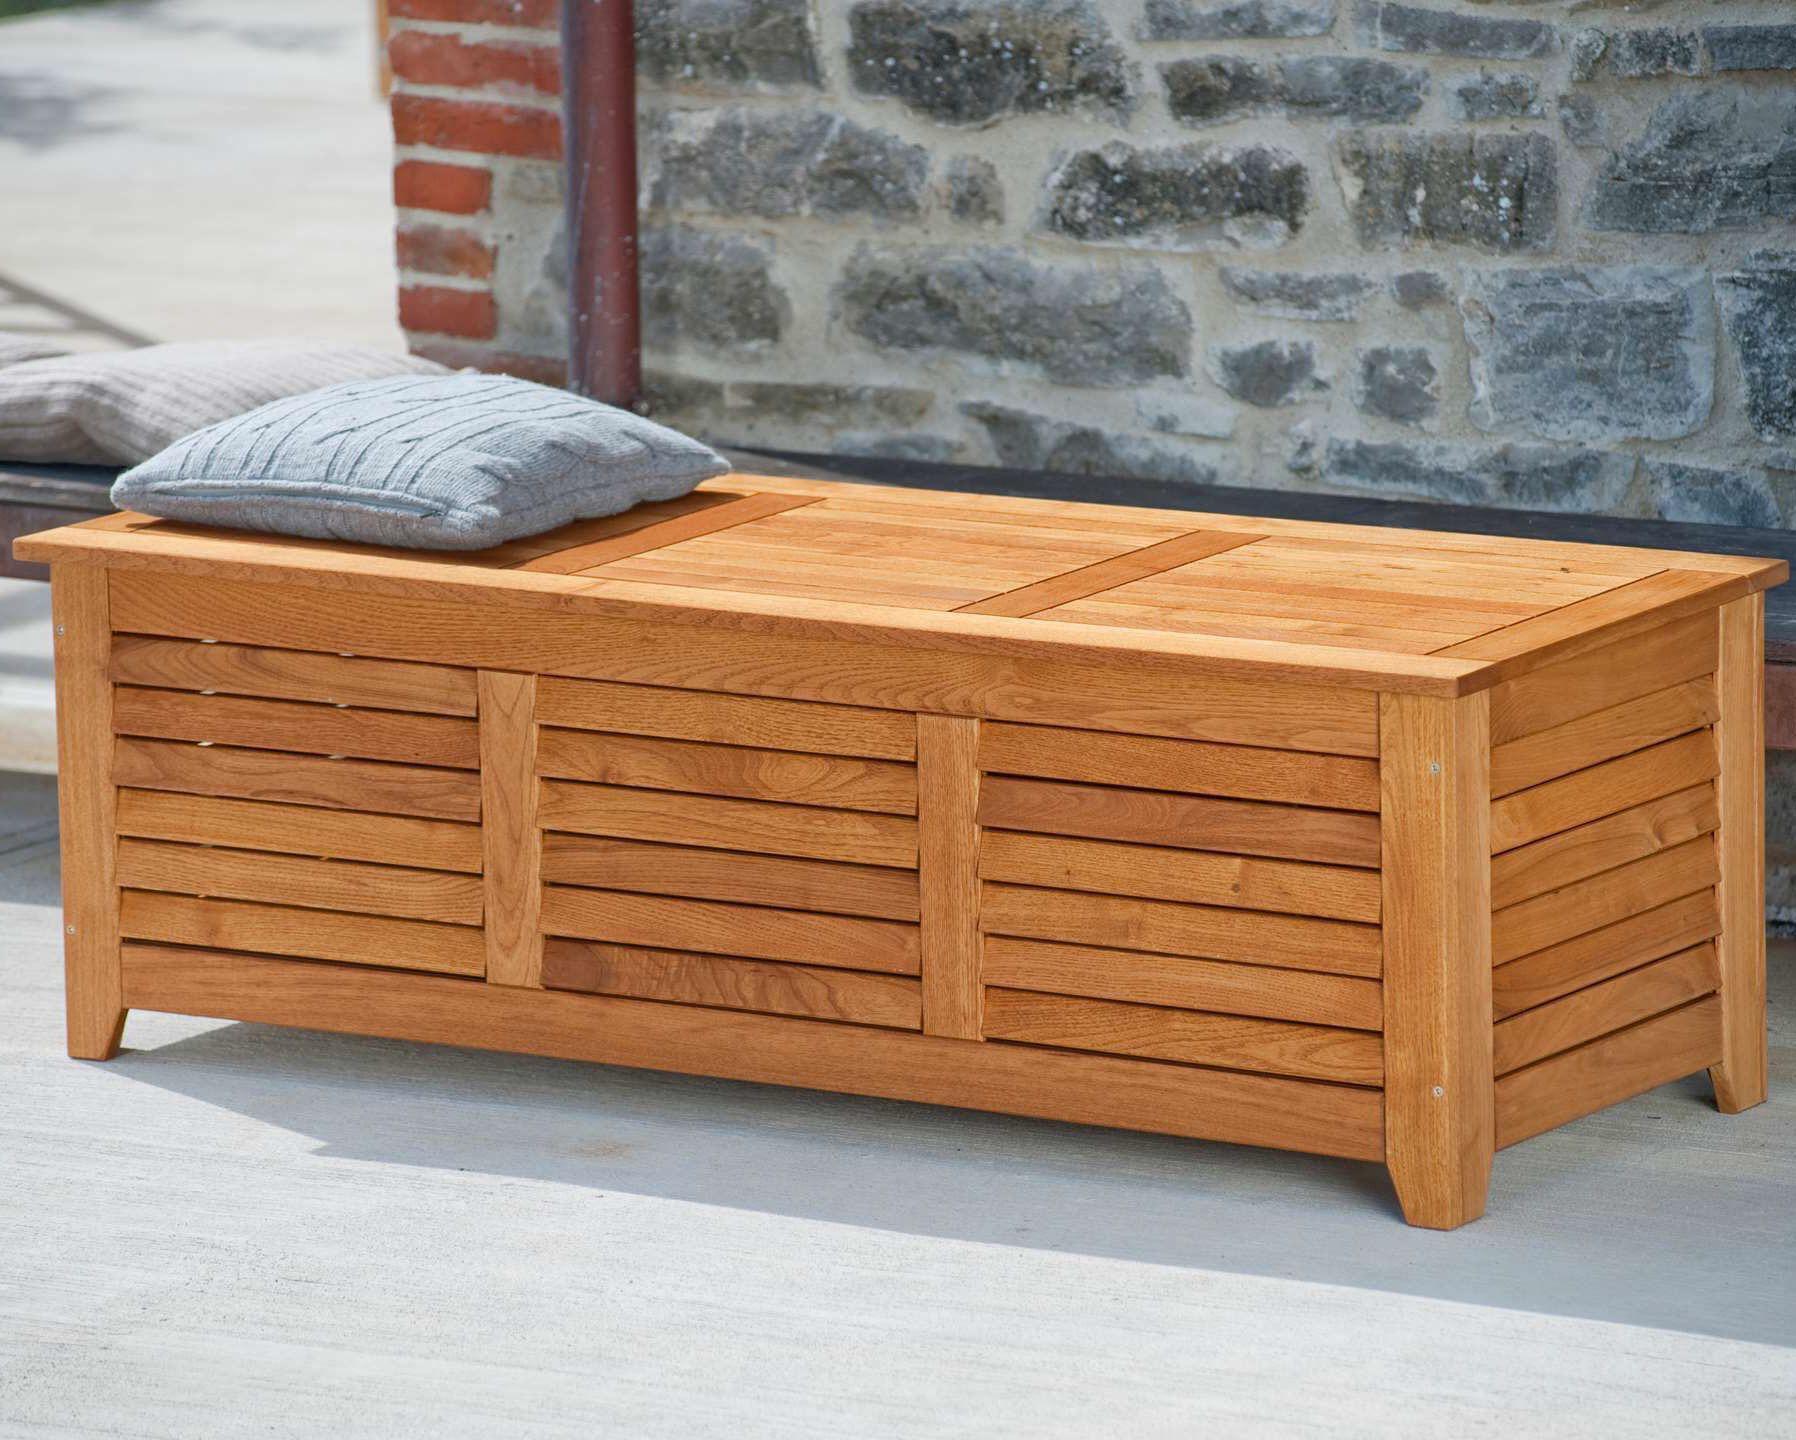 Gartenbank modern holz  Gartenbank / modern / Holz - FLOR - Pircher